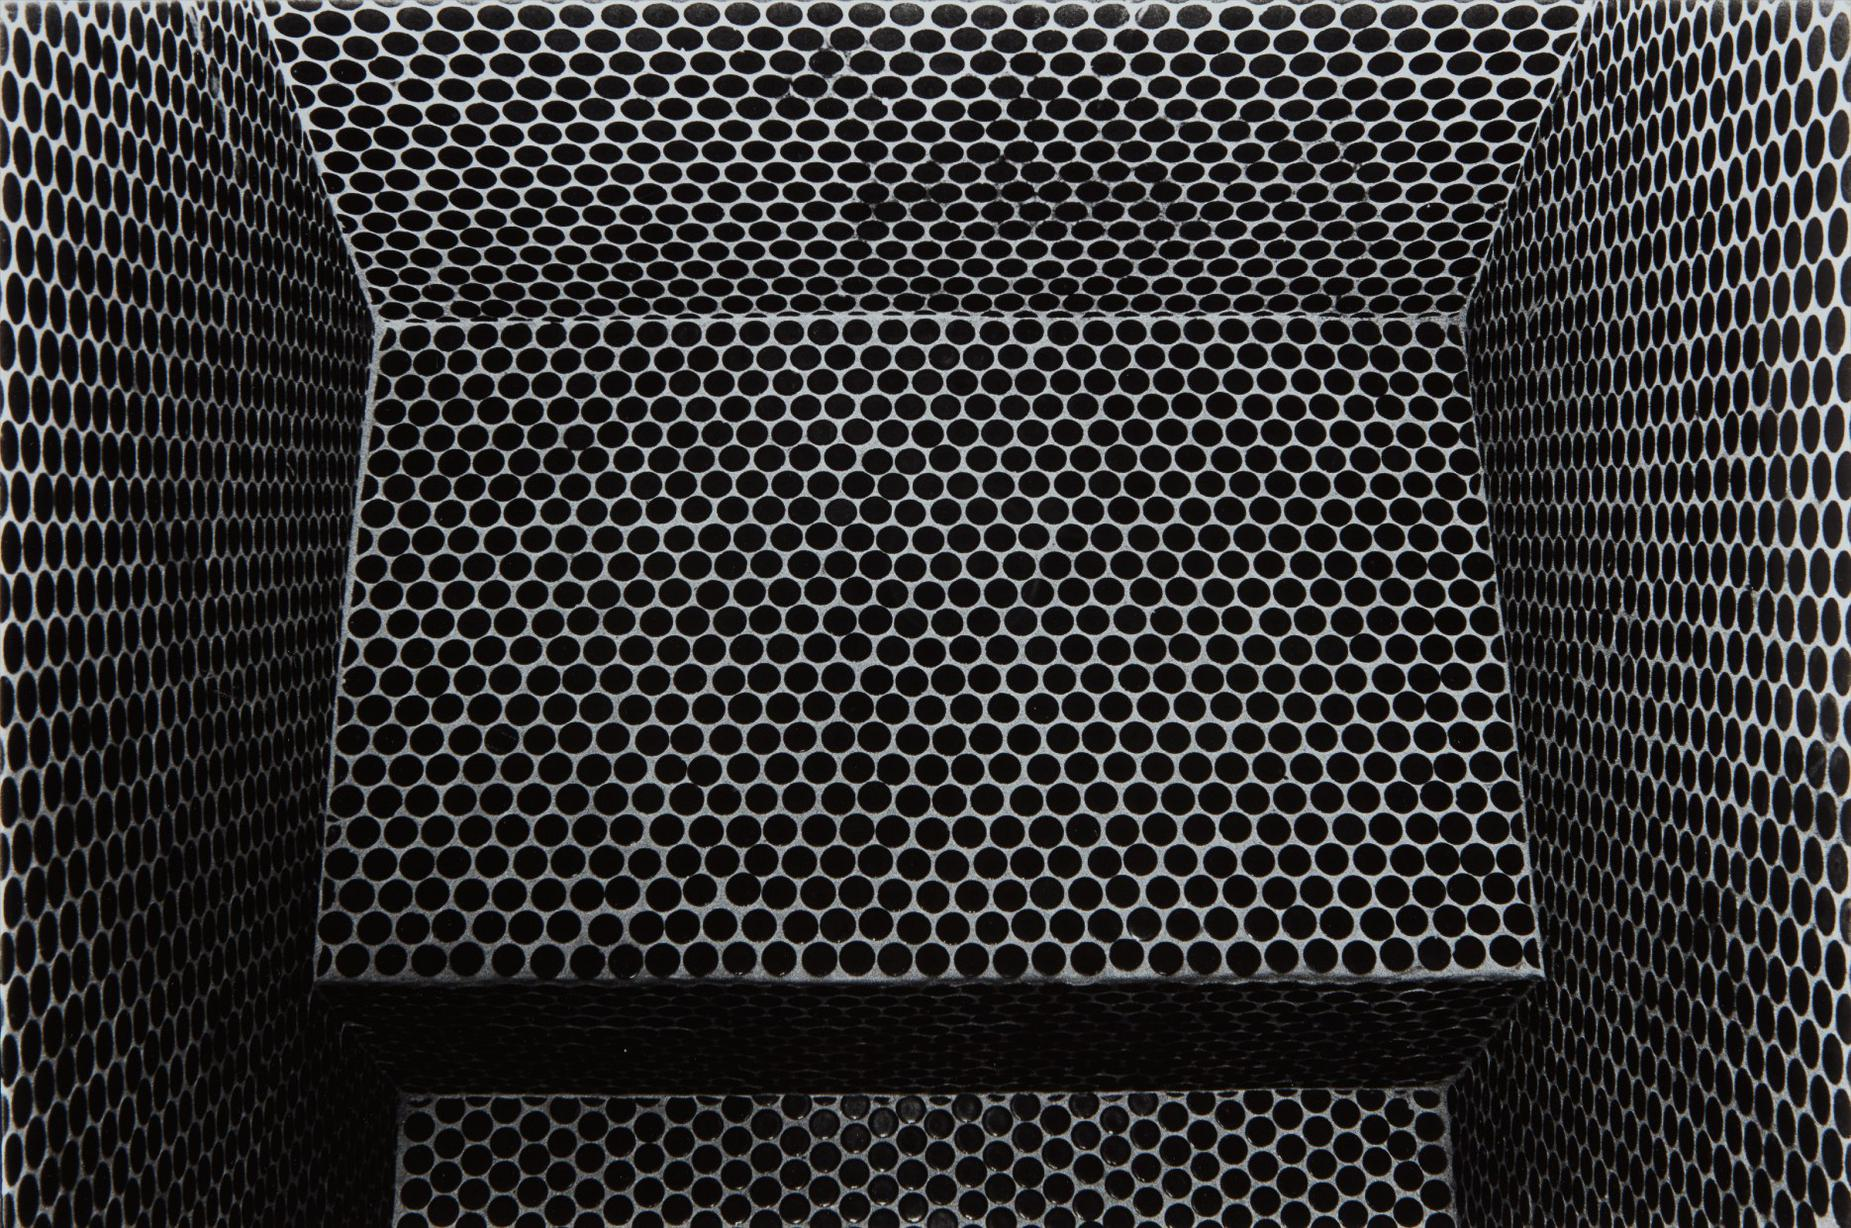 Daido Moriyama-How To Create A Beautiful Picture 3: Tiles Of Aizuwakamatsu-1987